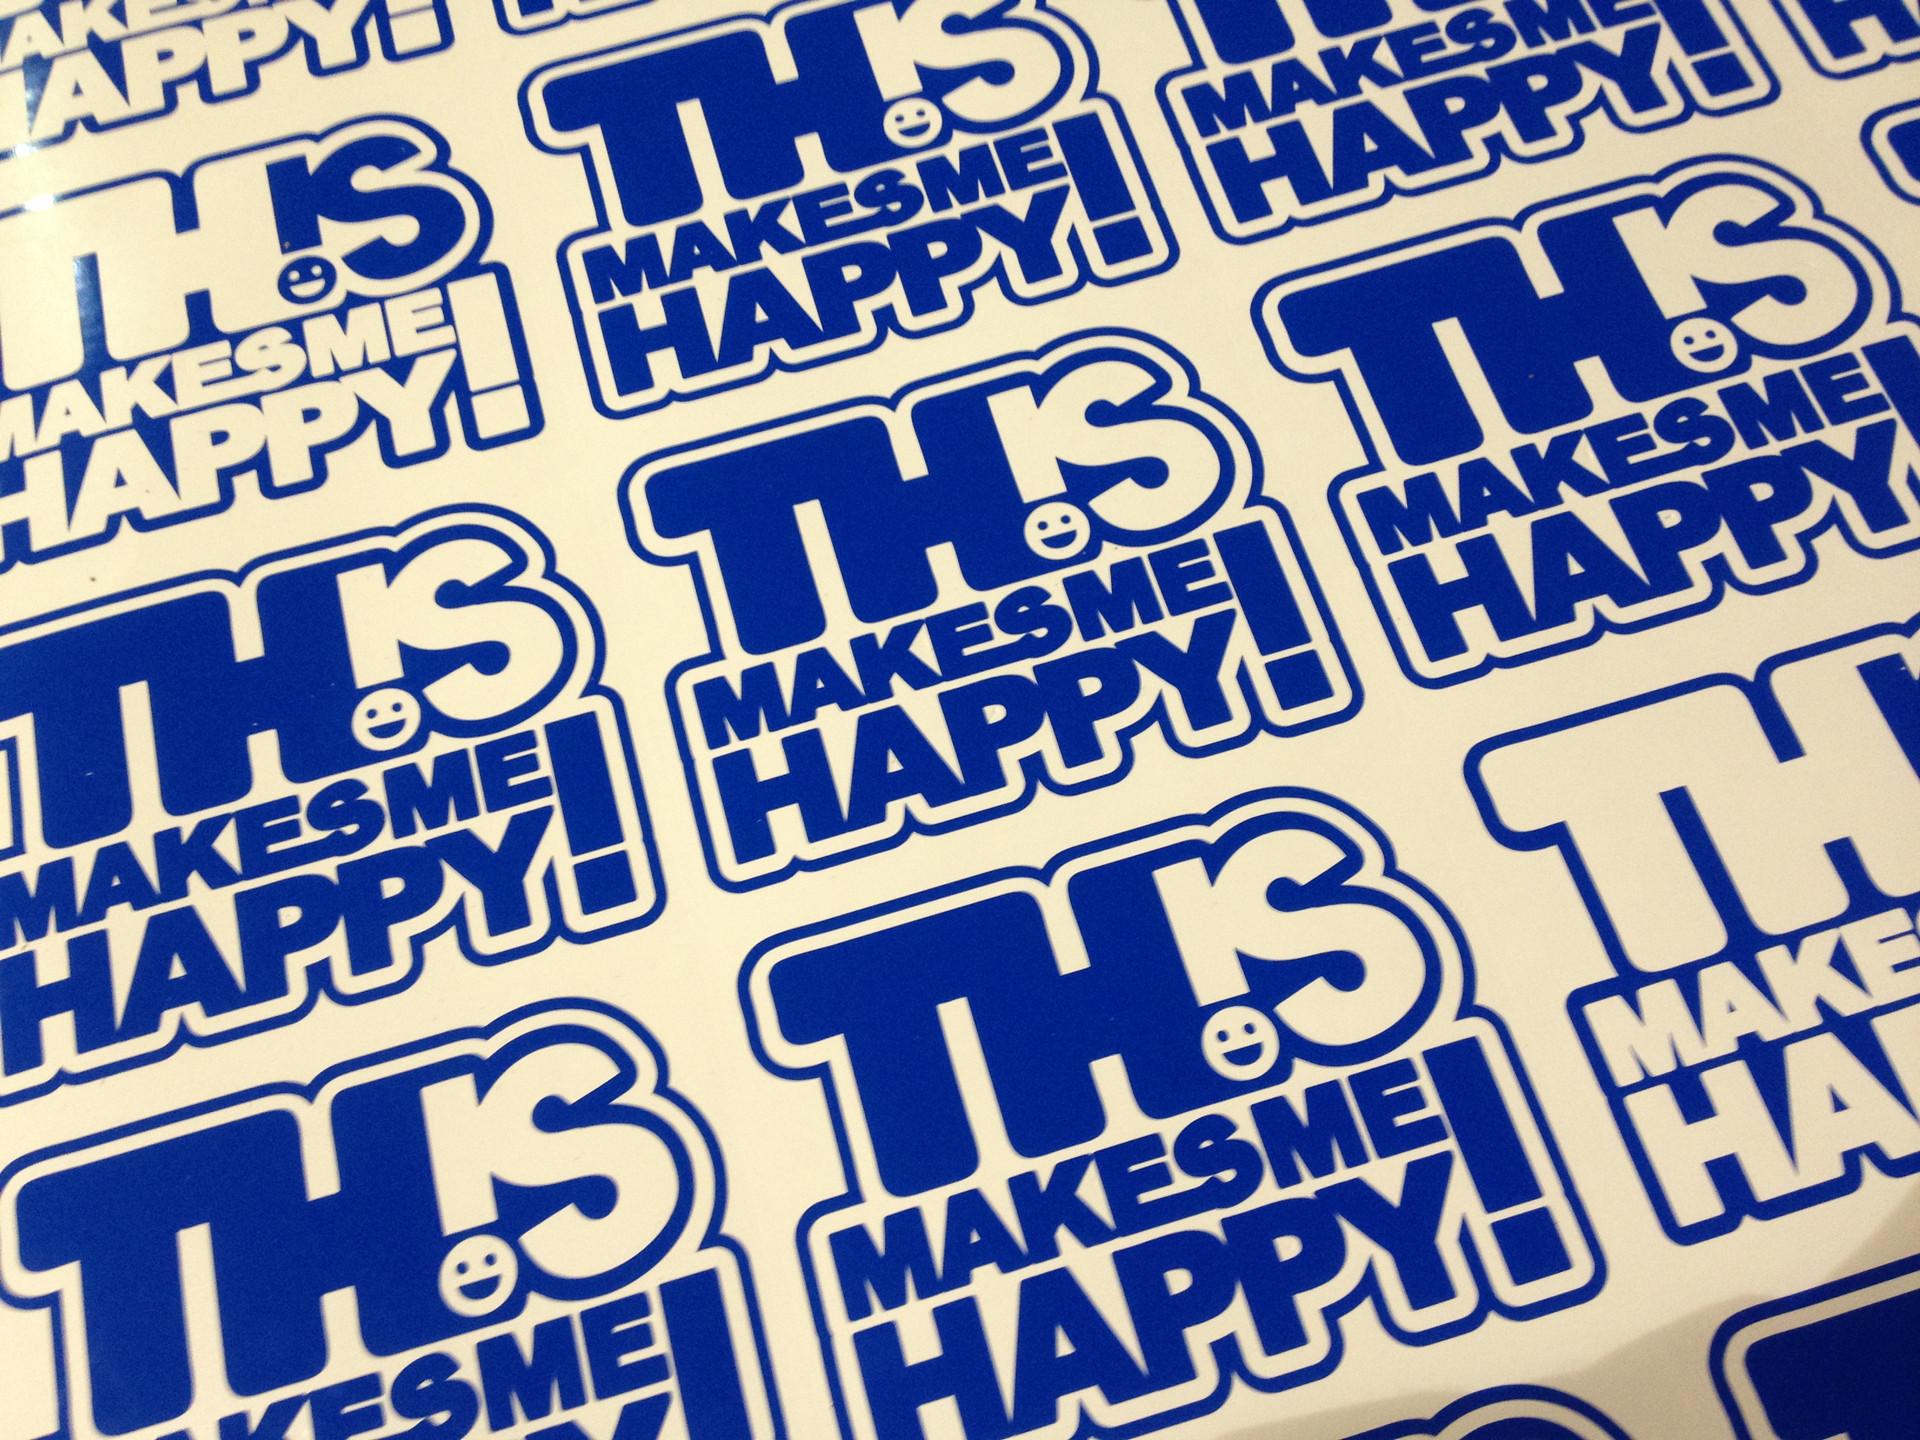 ThisMakesMeHappySticks.JPG